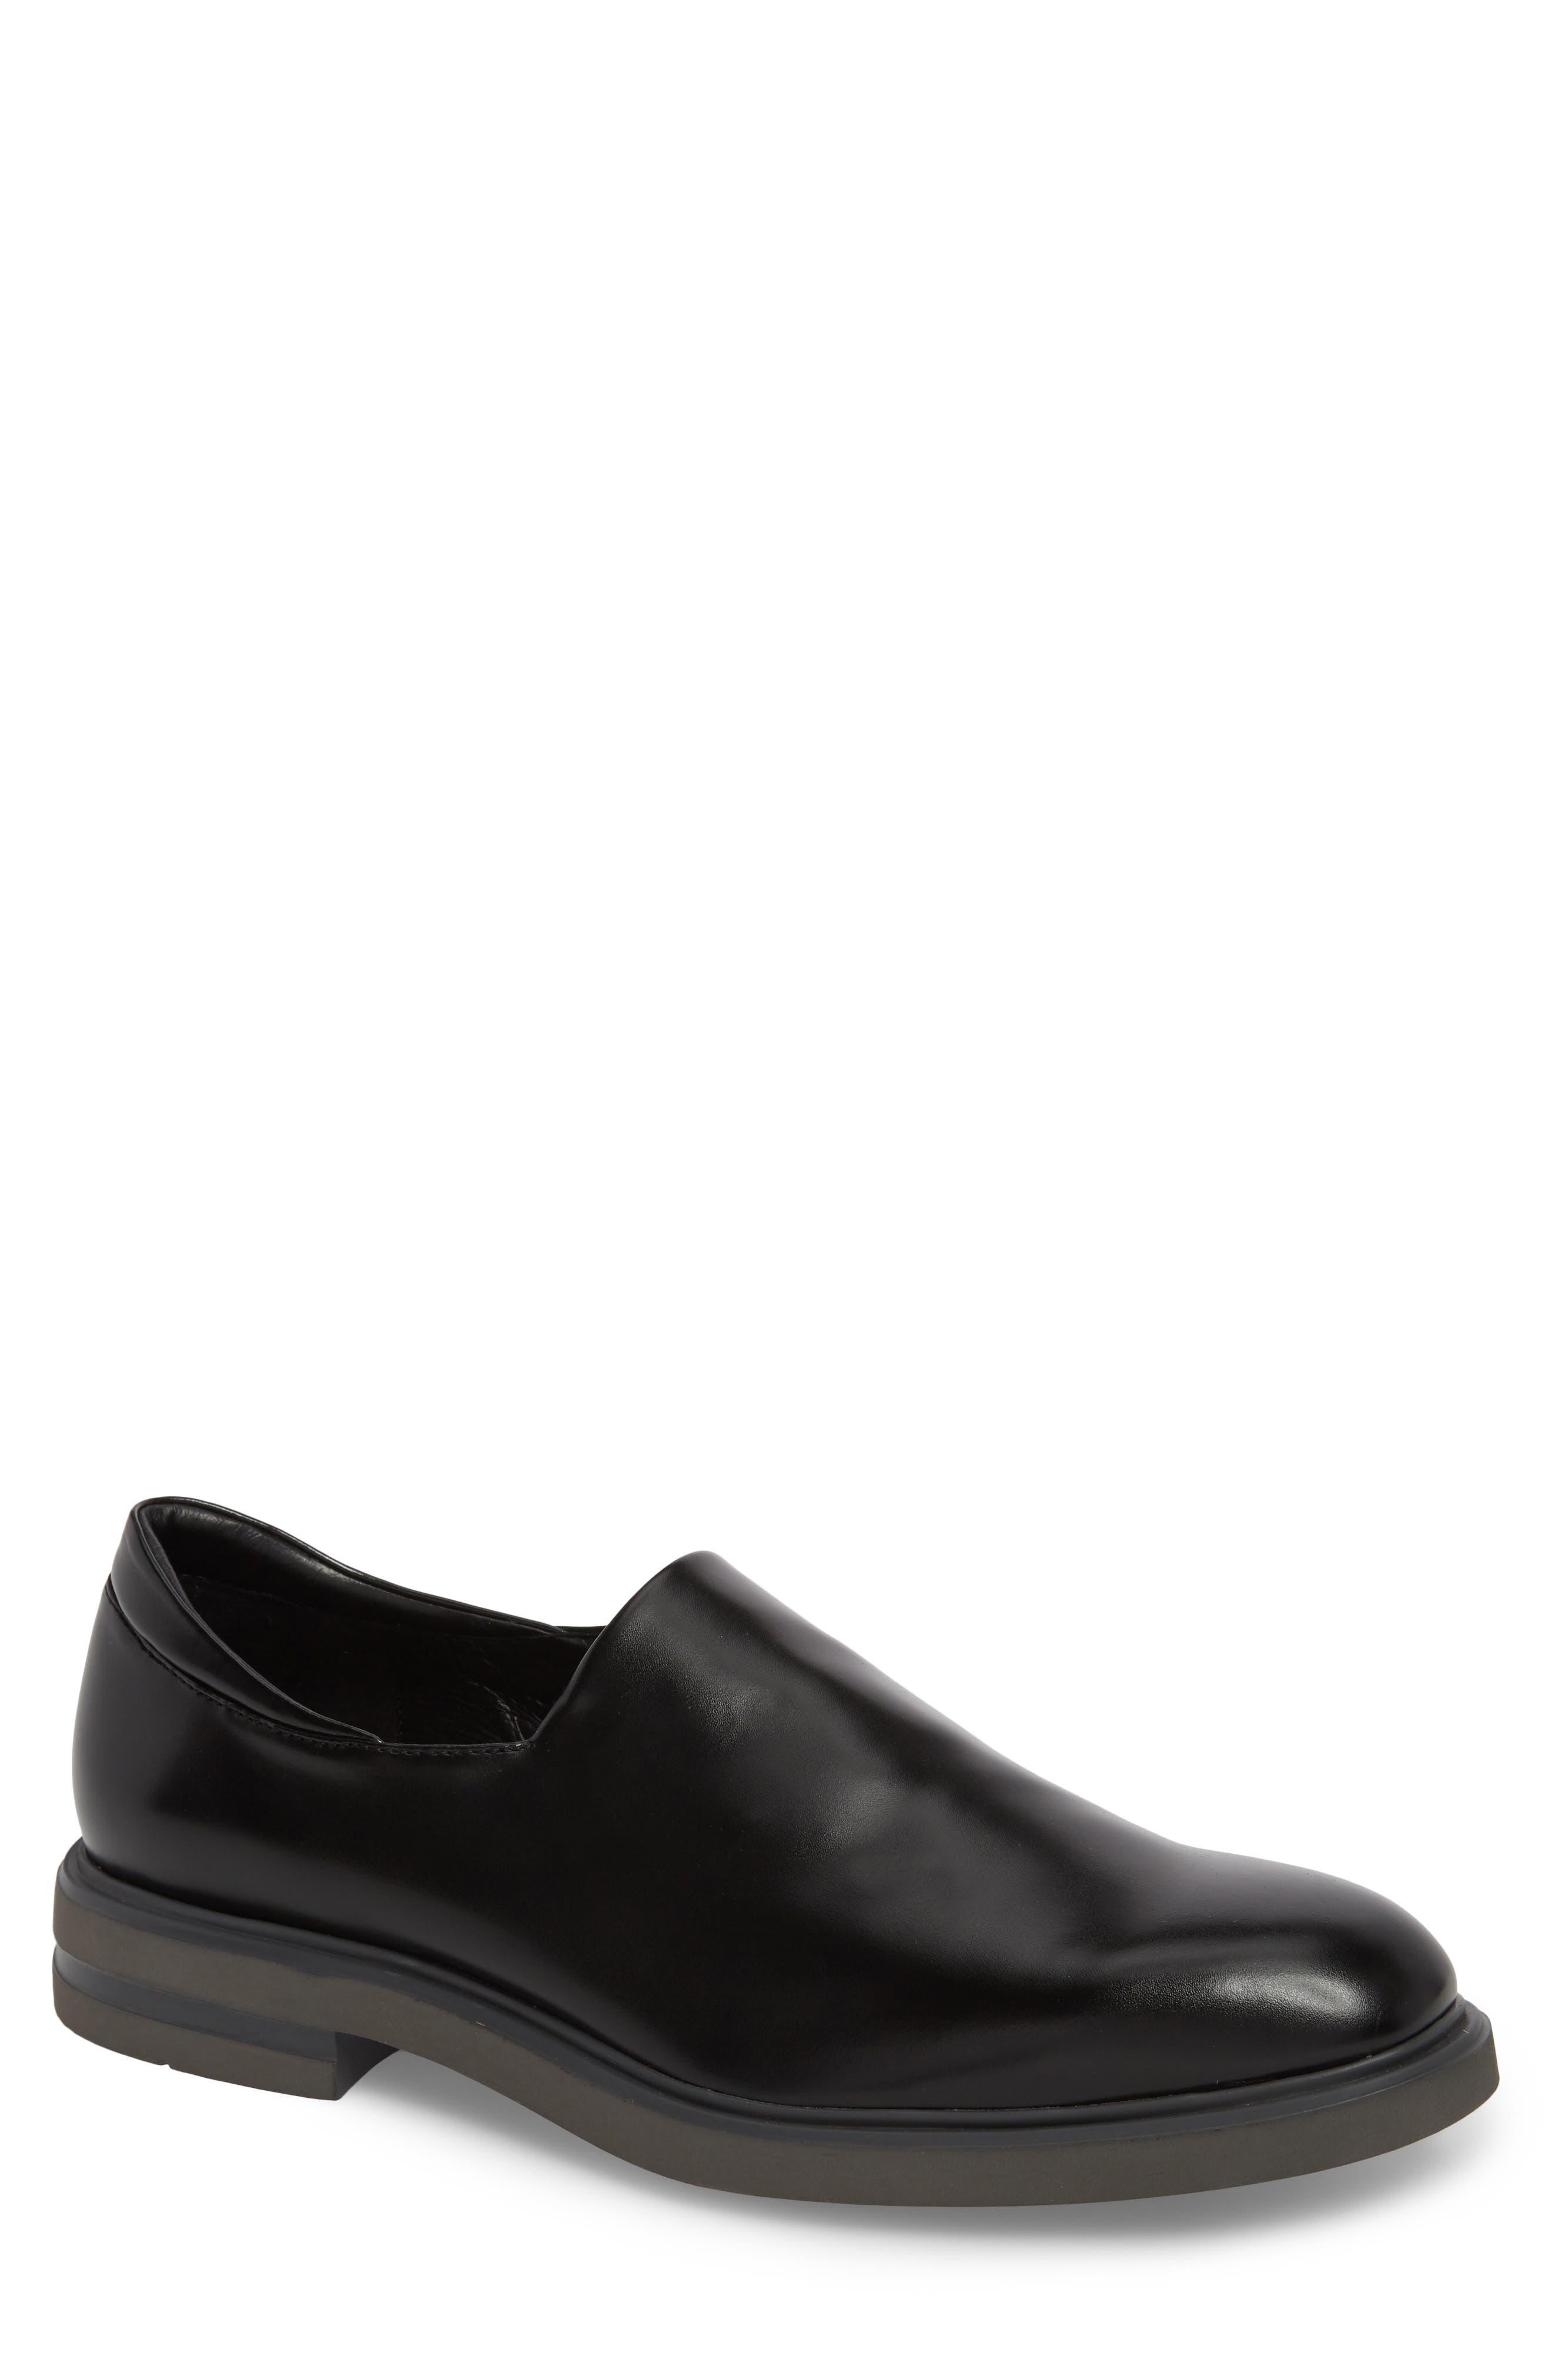 Eliam Venetian Loafer,                         Main,                         color, Black Leather